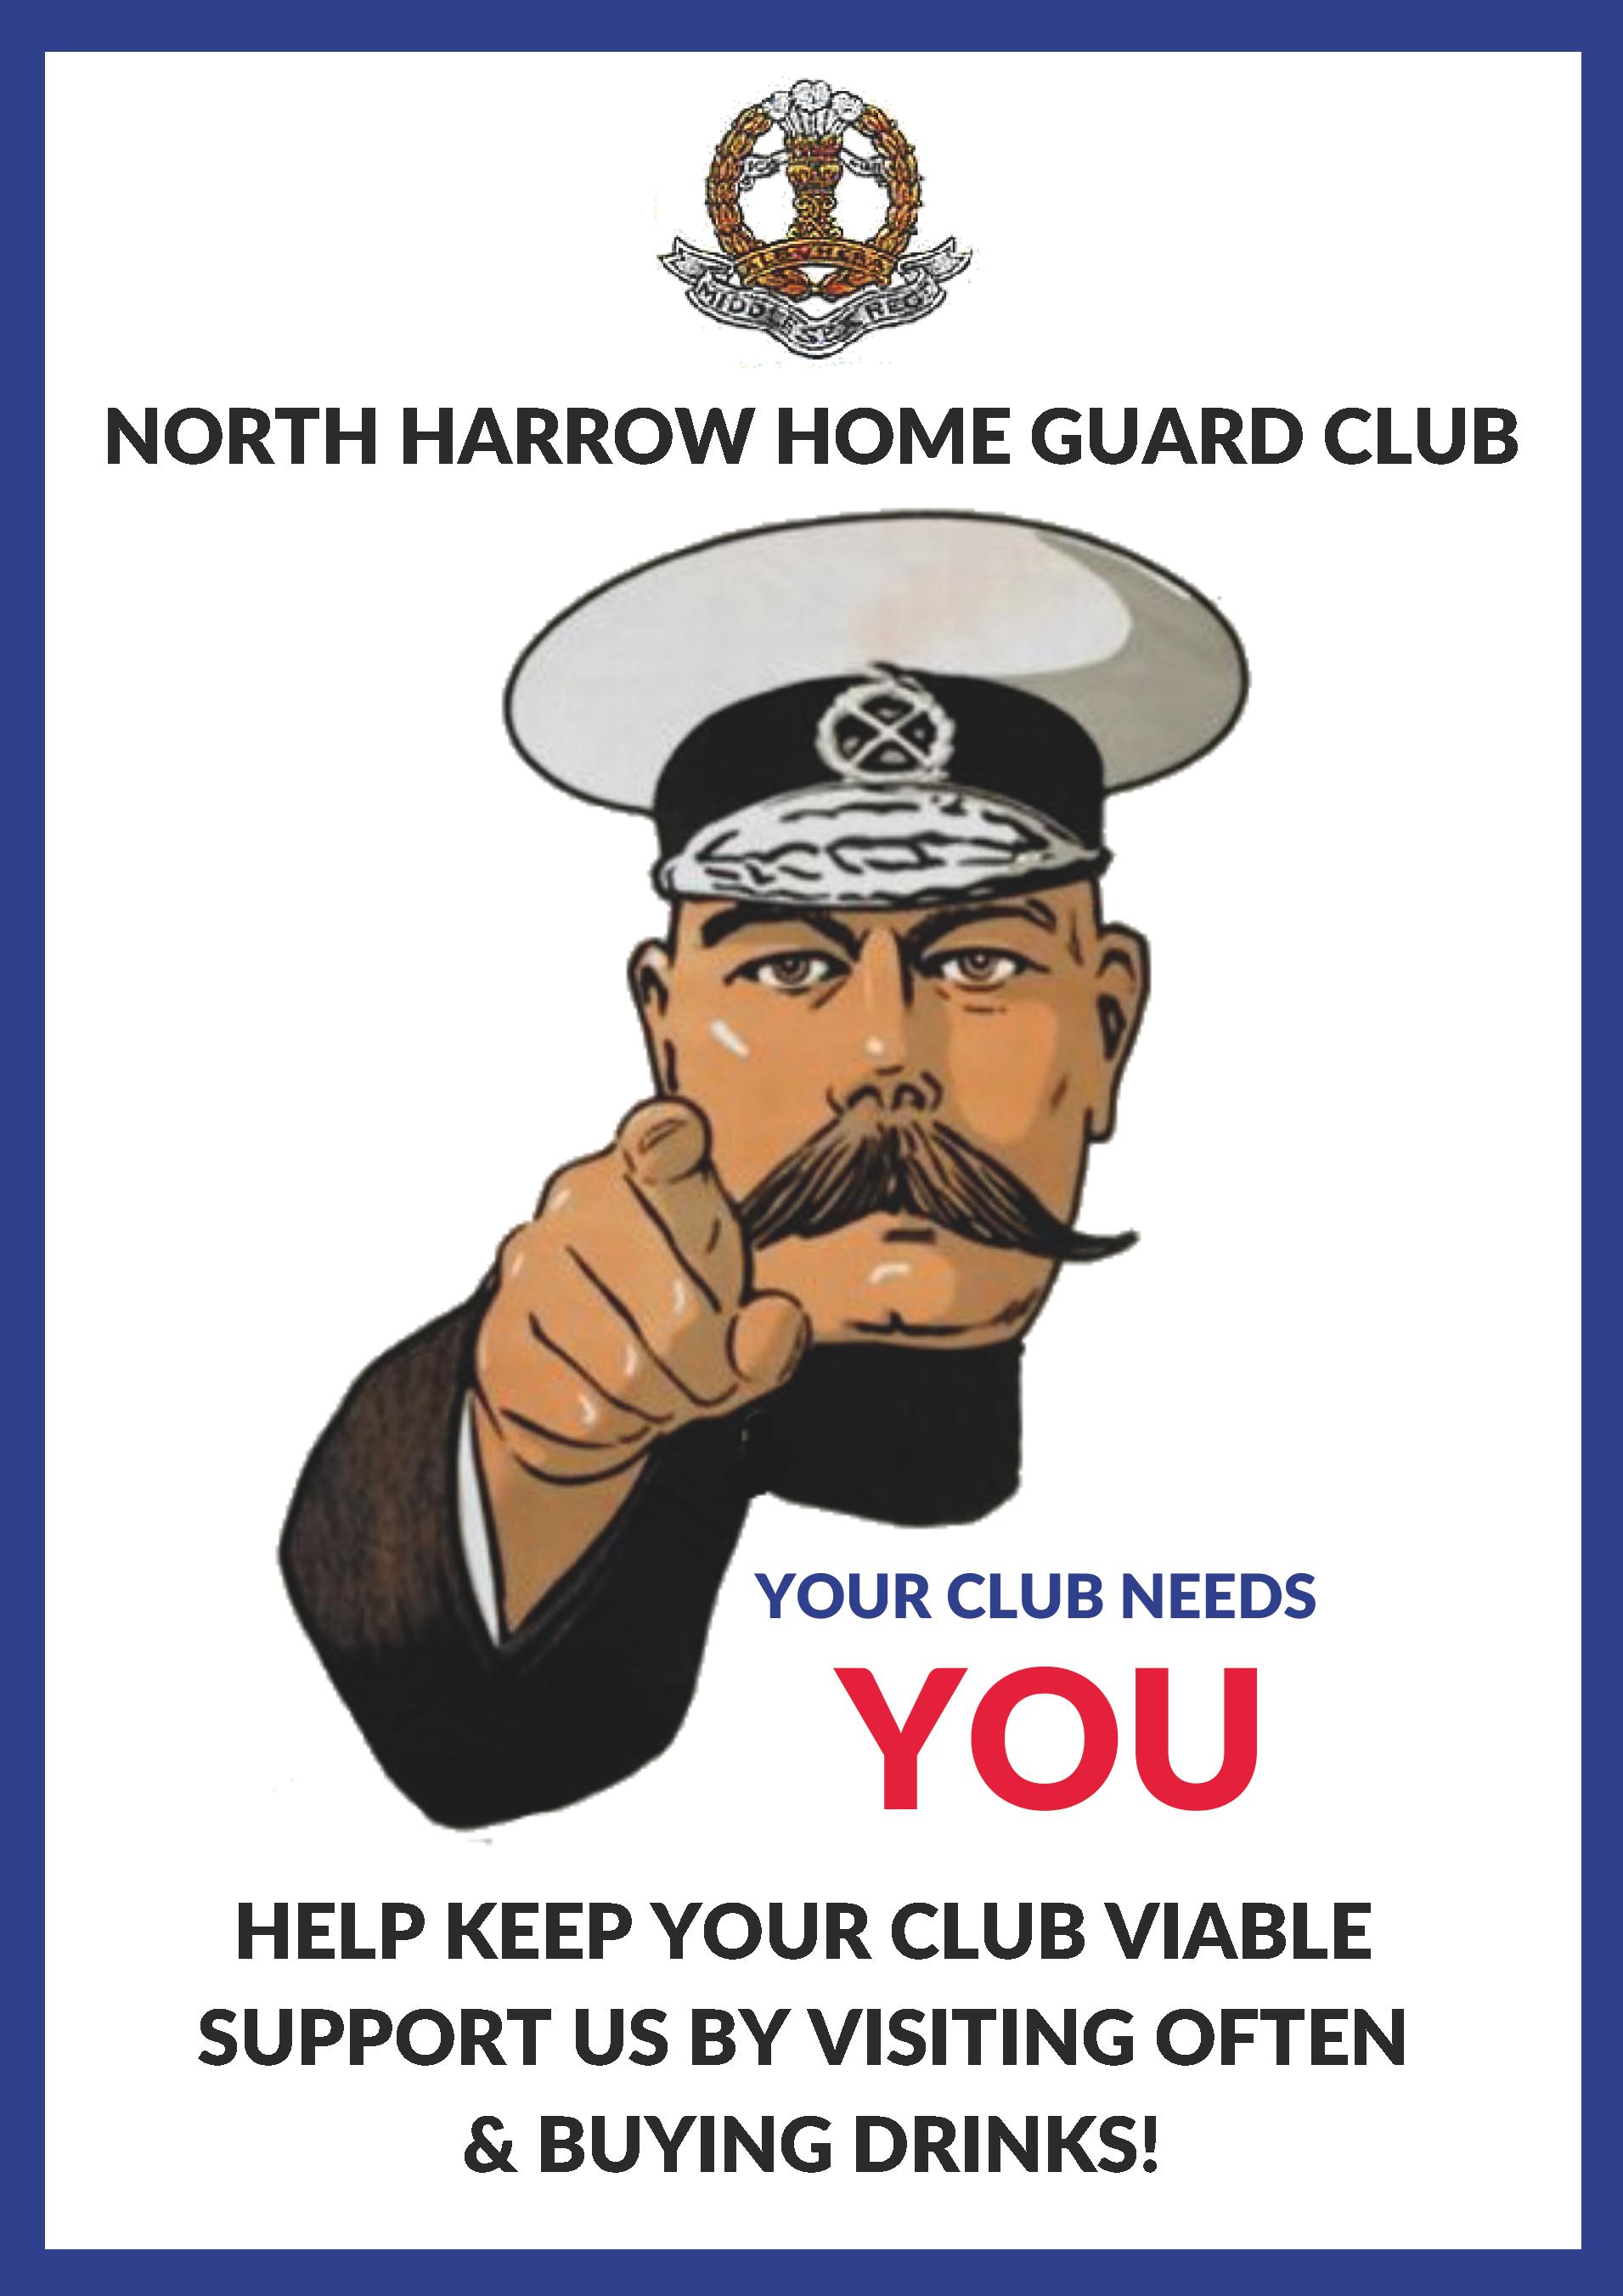 COVID19 - Club Needs You 2